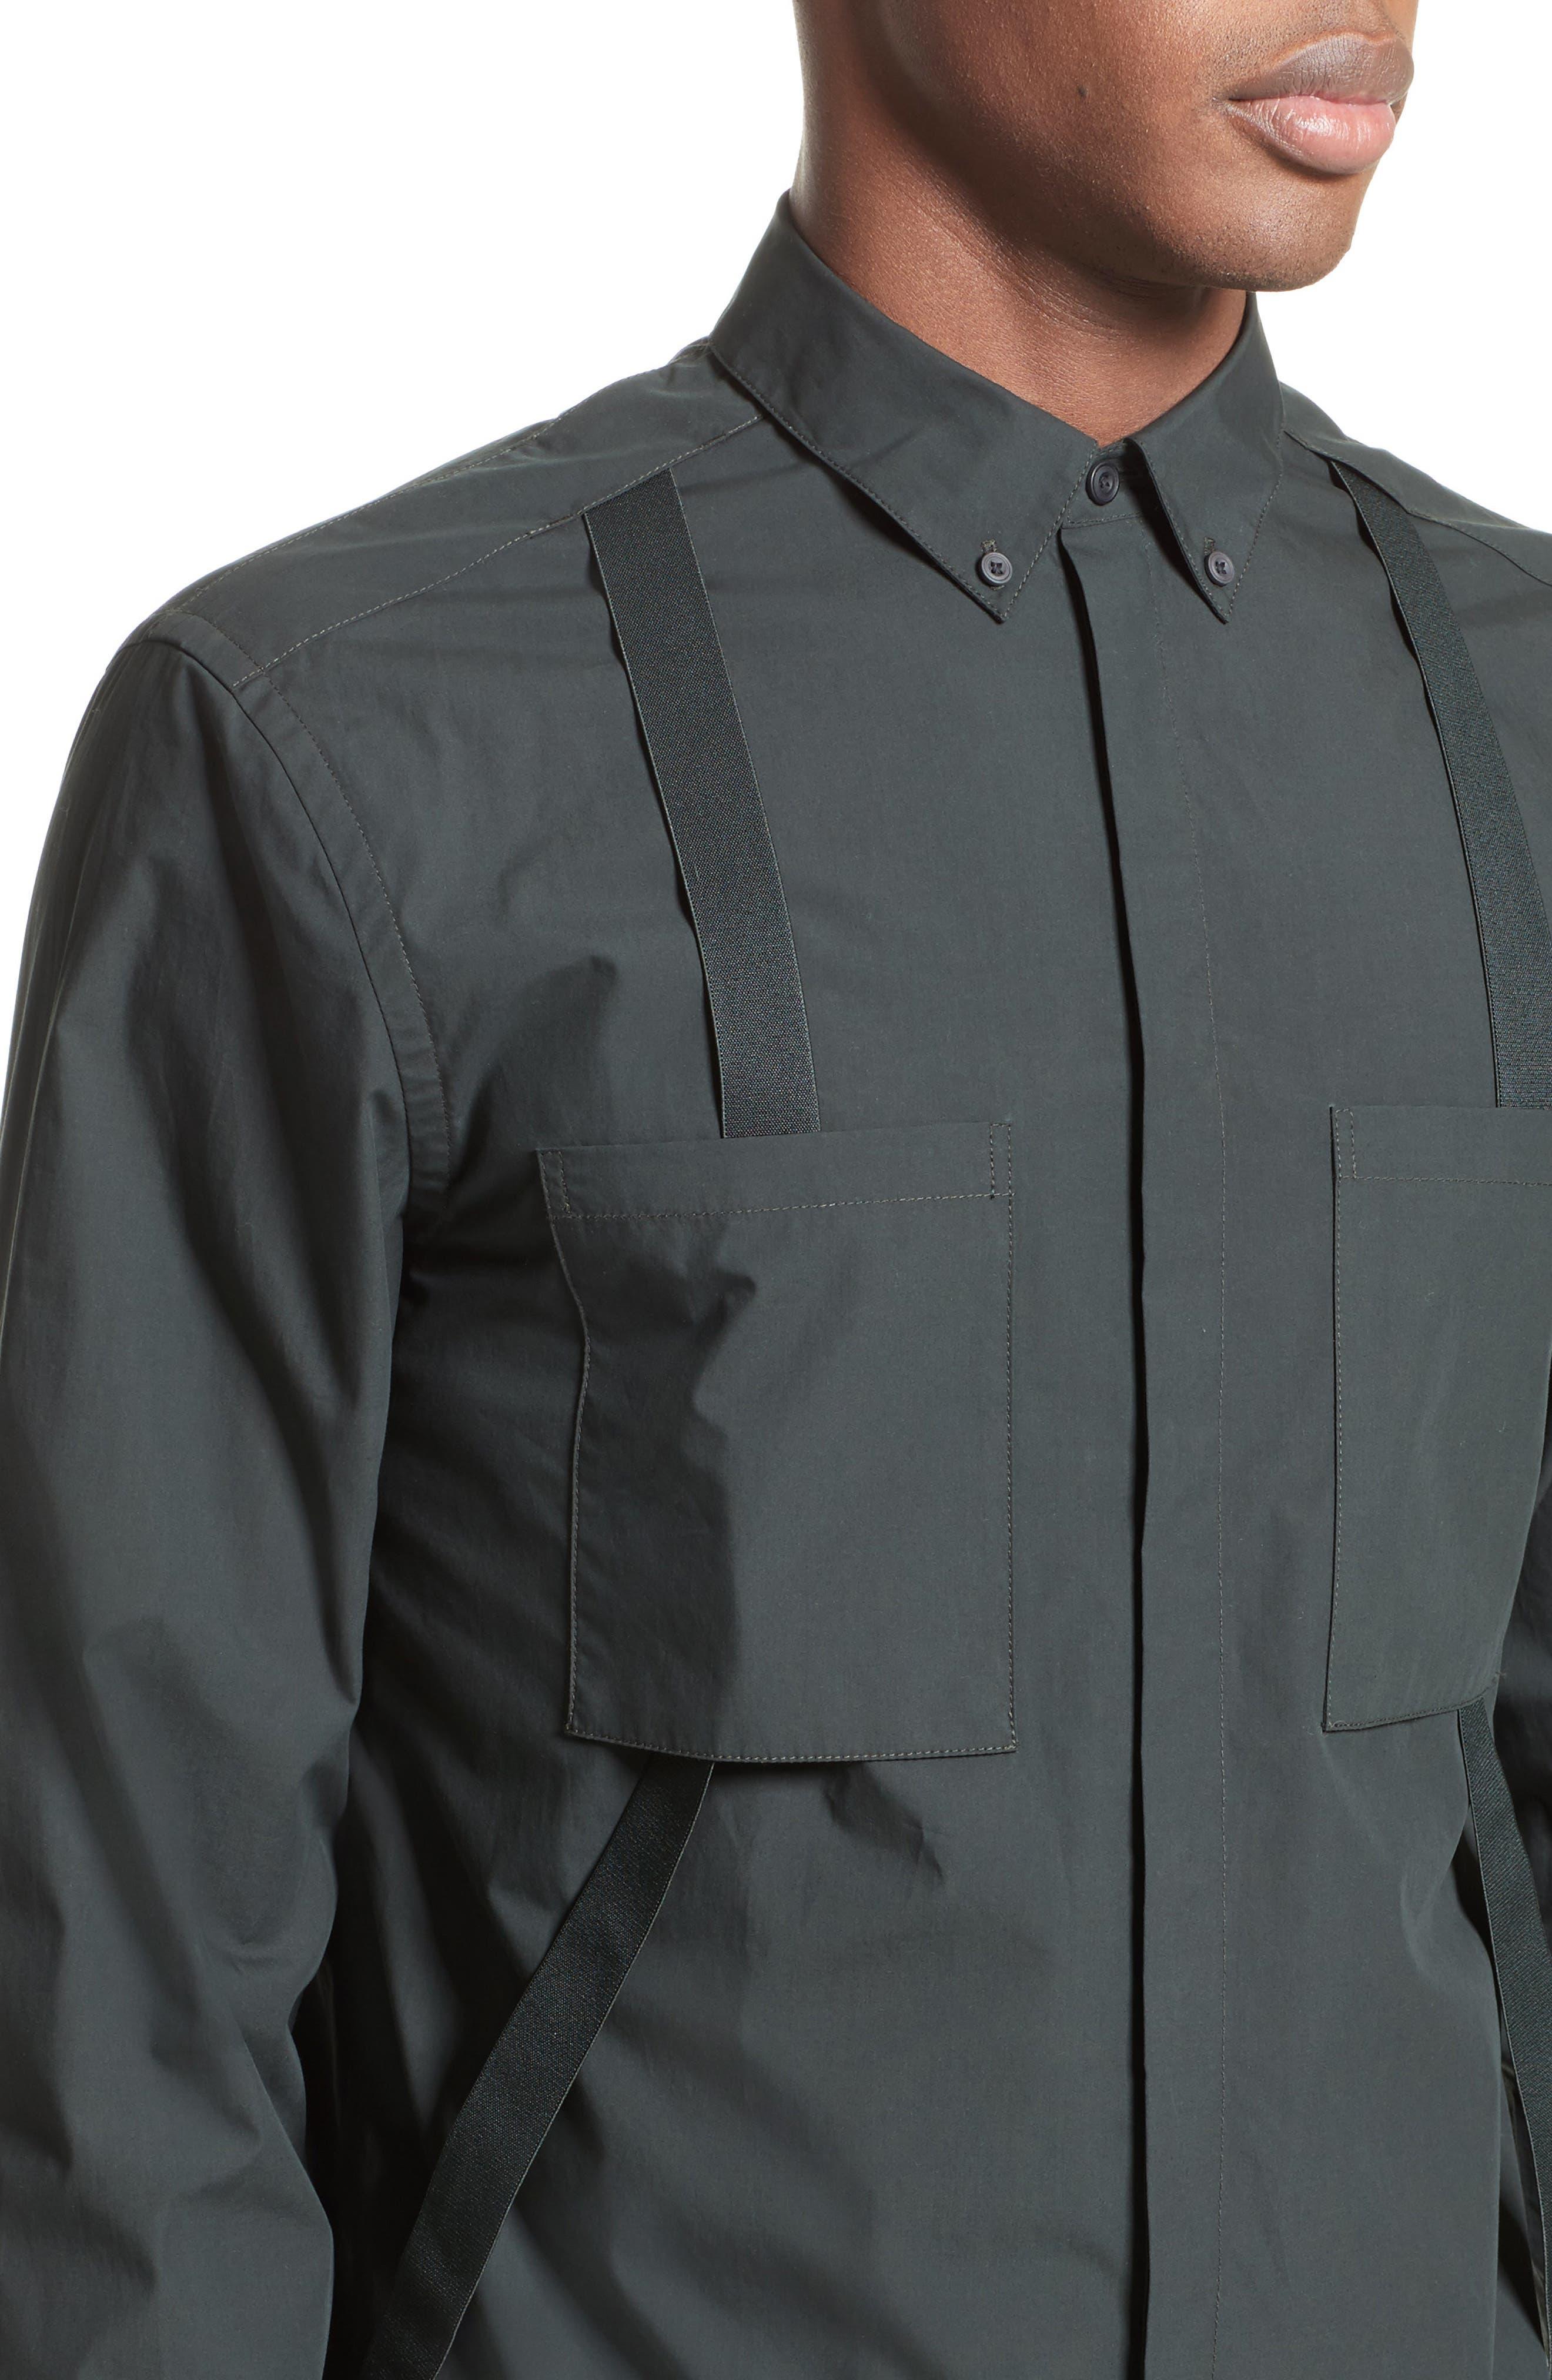 Suspender Shirt,                             Alternate thumbnail 5, color,                             334